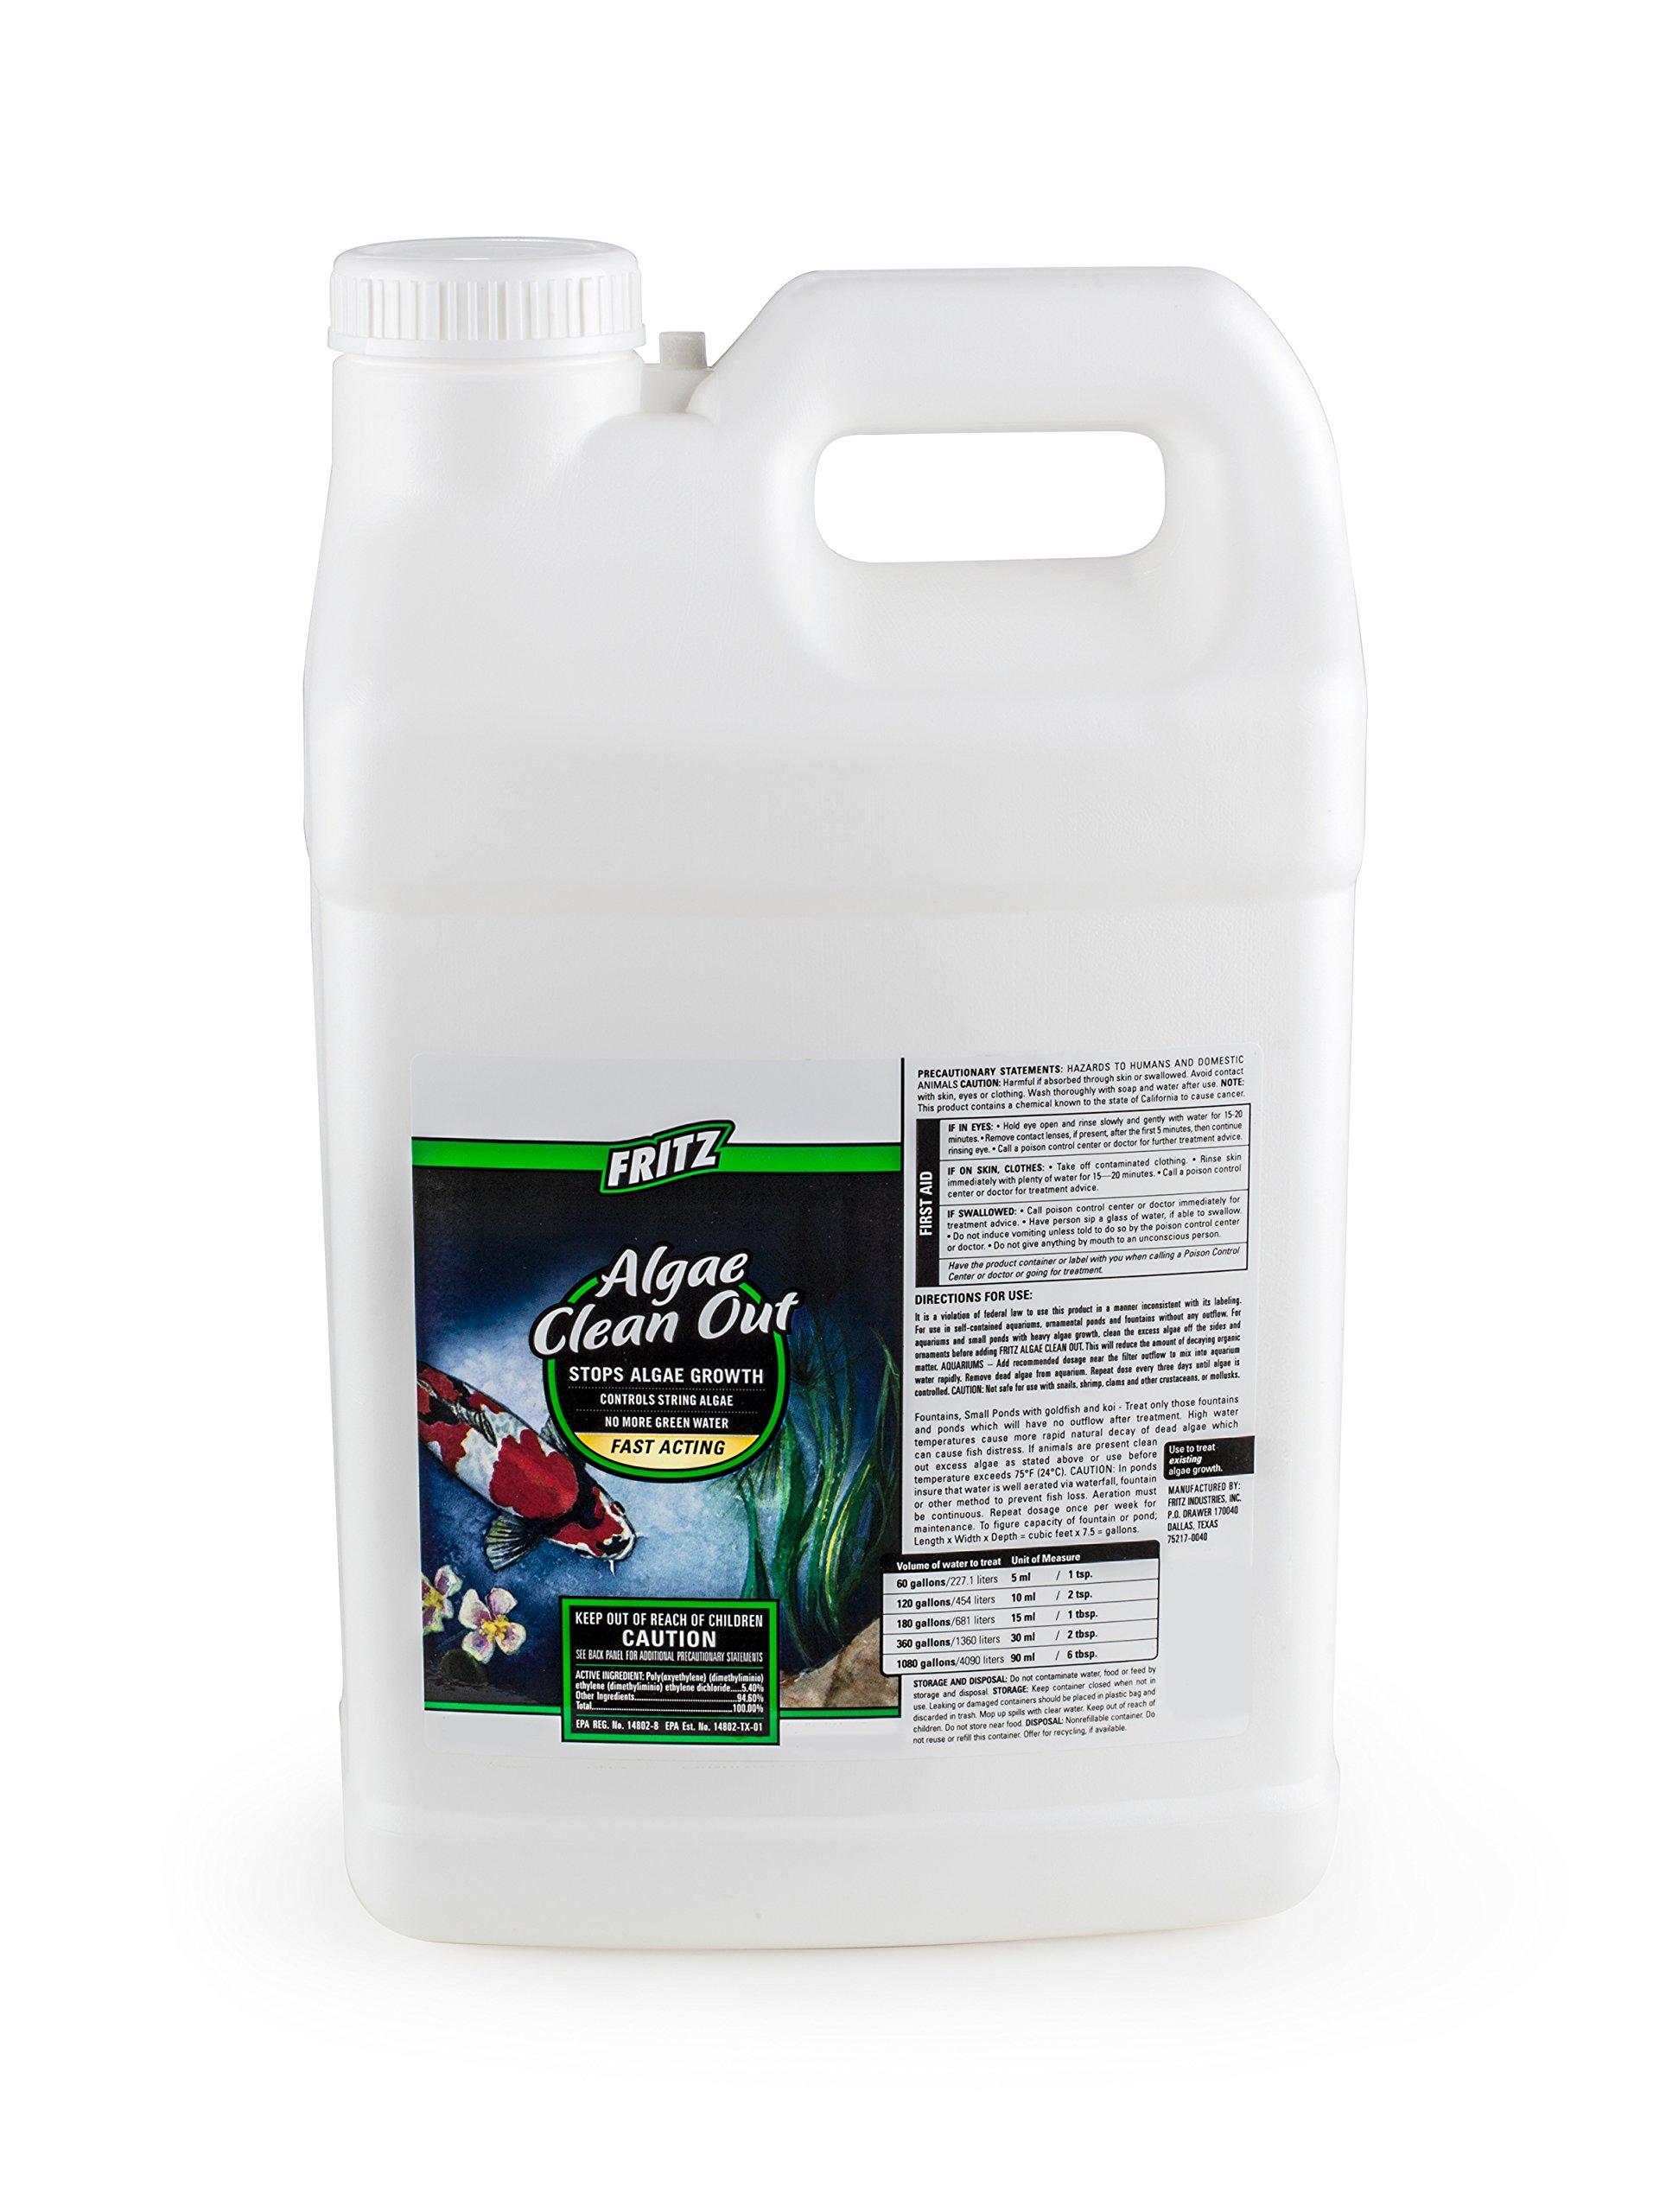 FritzPond - Algae Clean Out Algaecide - 2.5 Gallon